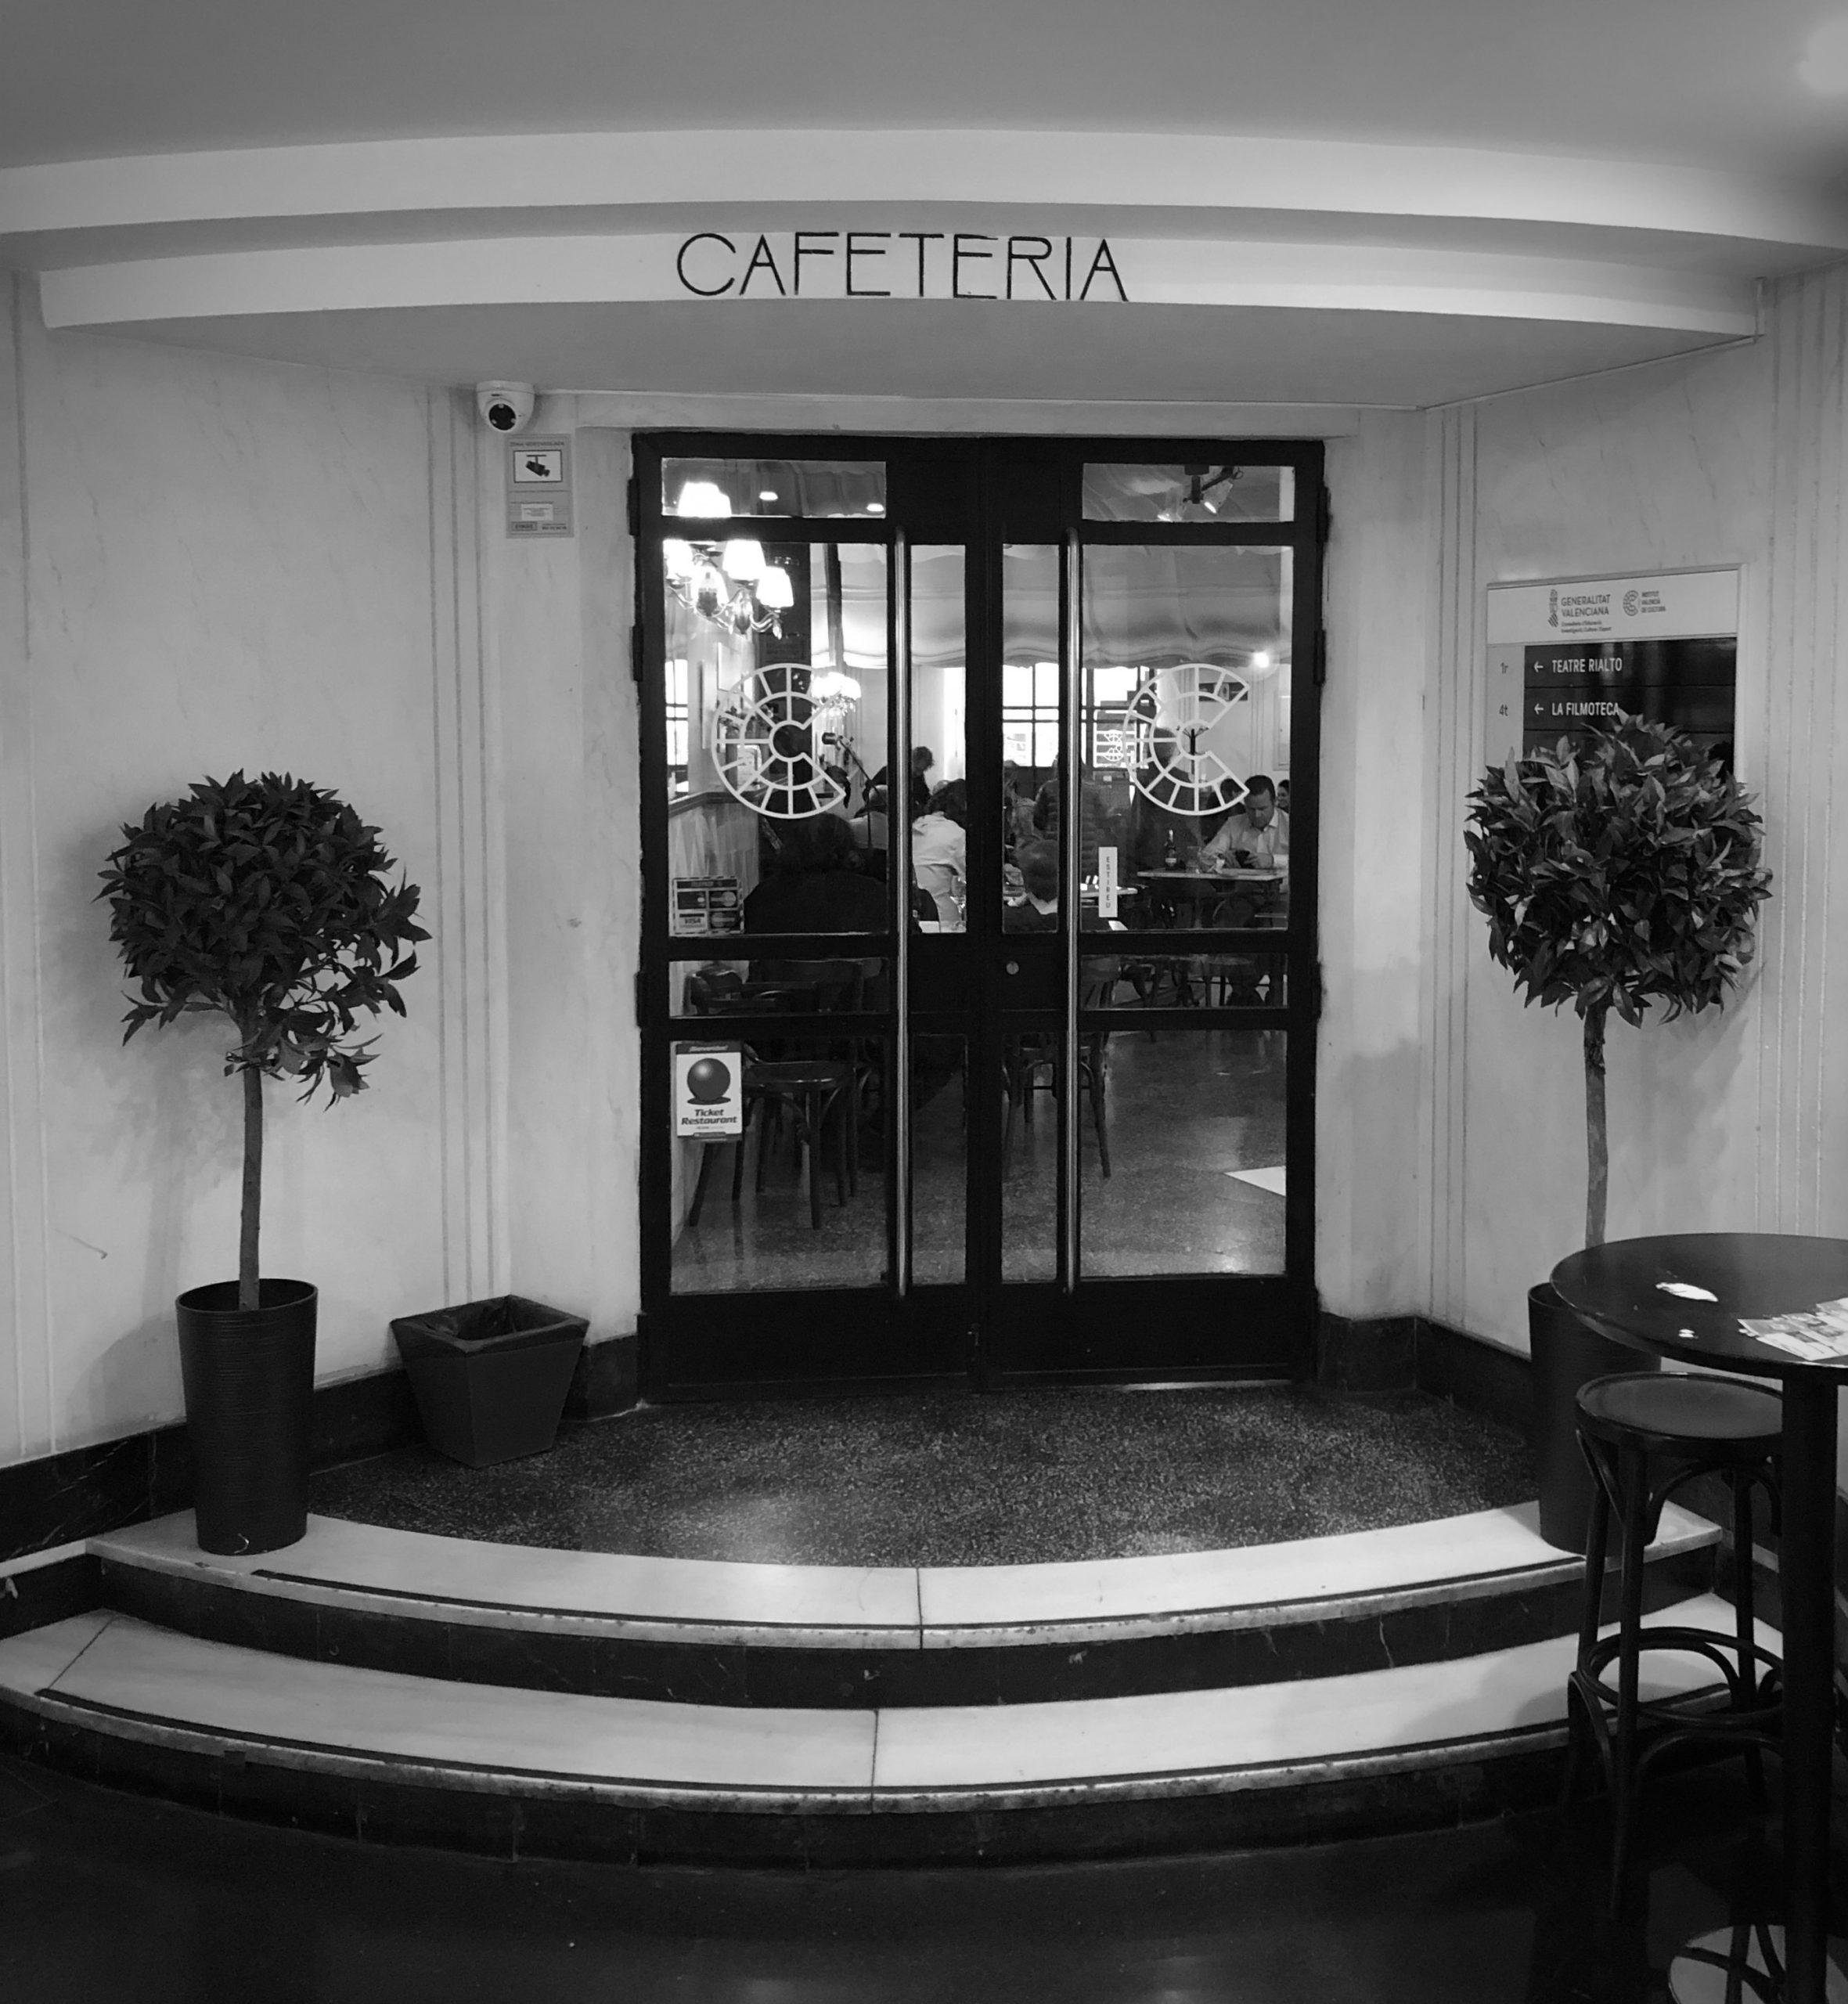 Valencia, Teatro Rialto, entrance to the cafeteria, Bauhaus